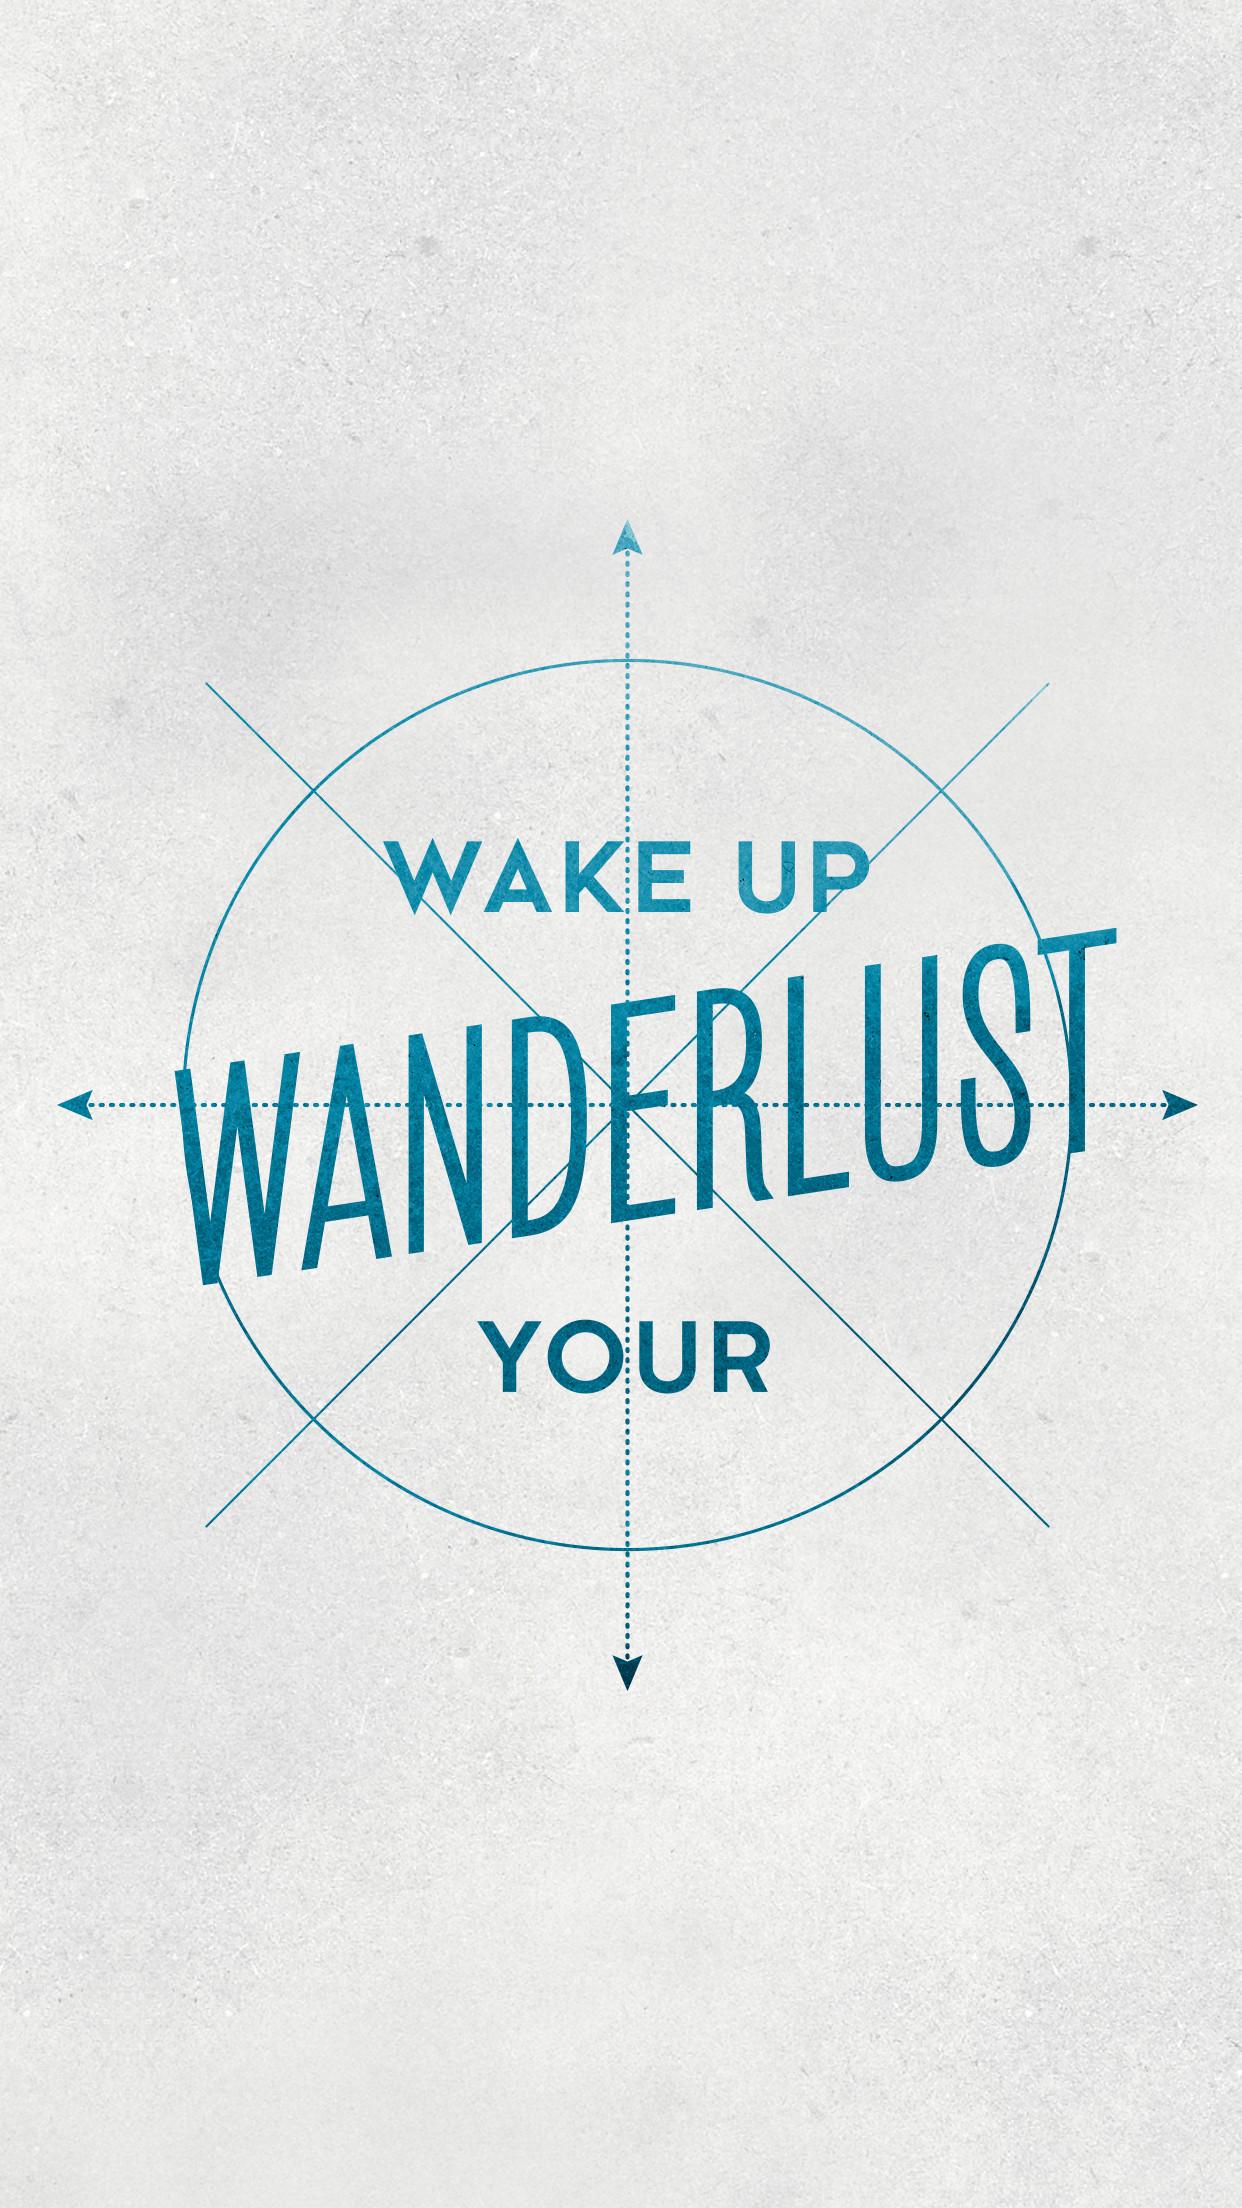 Grey teal wanderlust compass iphone phone wallpaper background lock screen